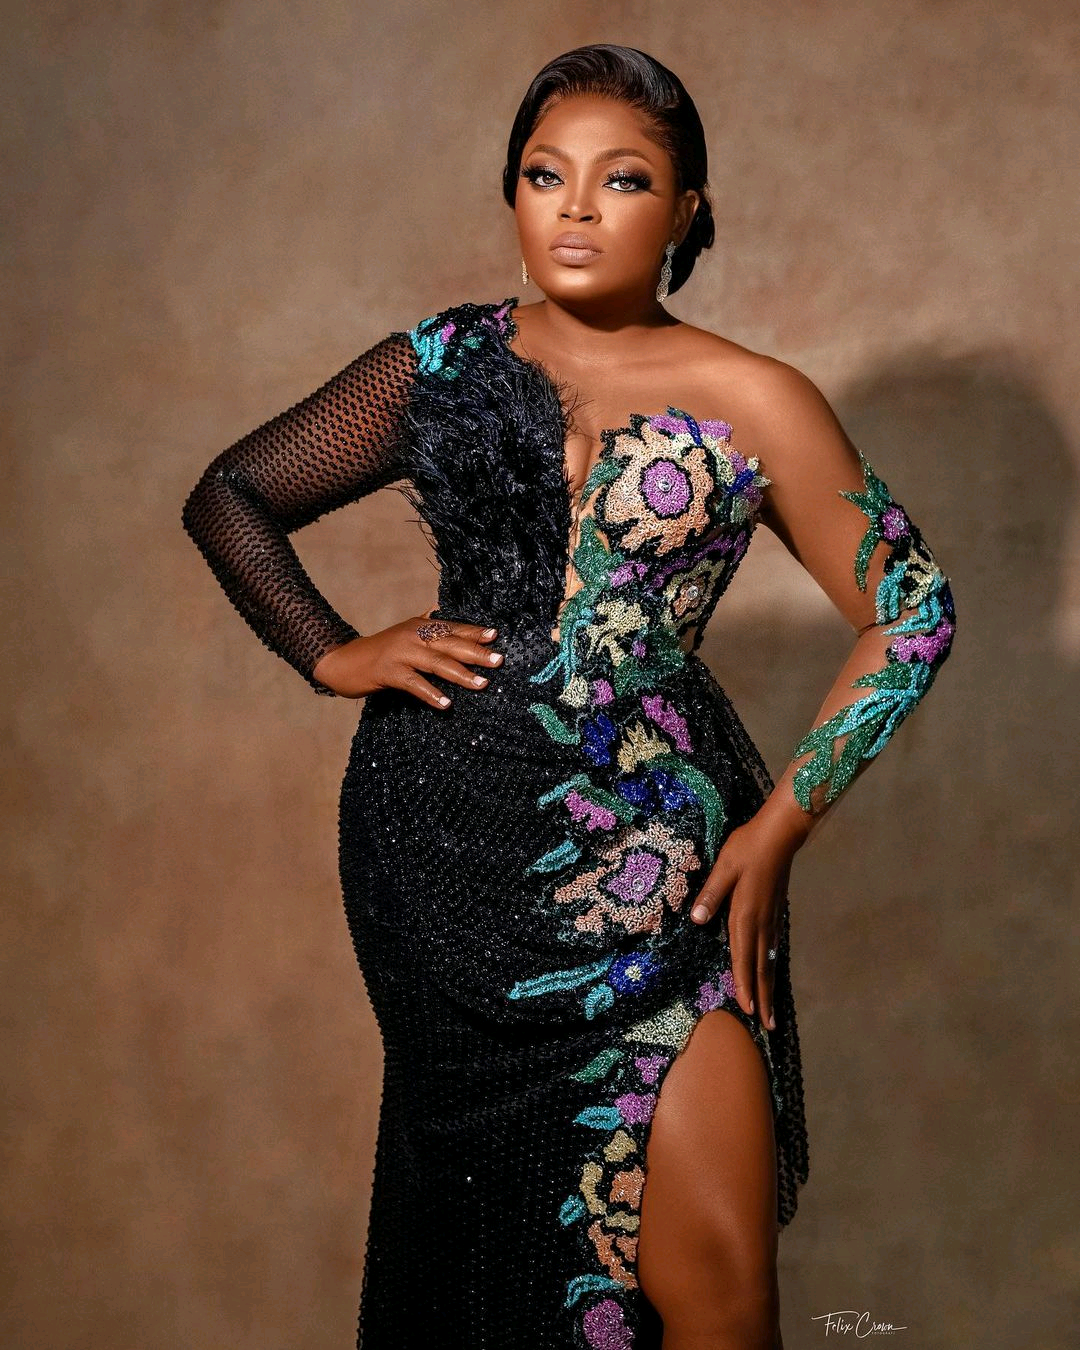 I Wish I Can Spend Money Without Working — Actress Funke Akindele